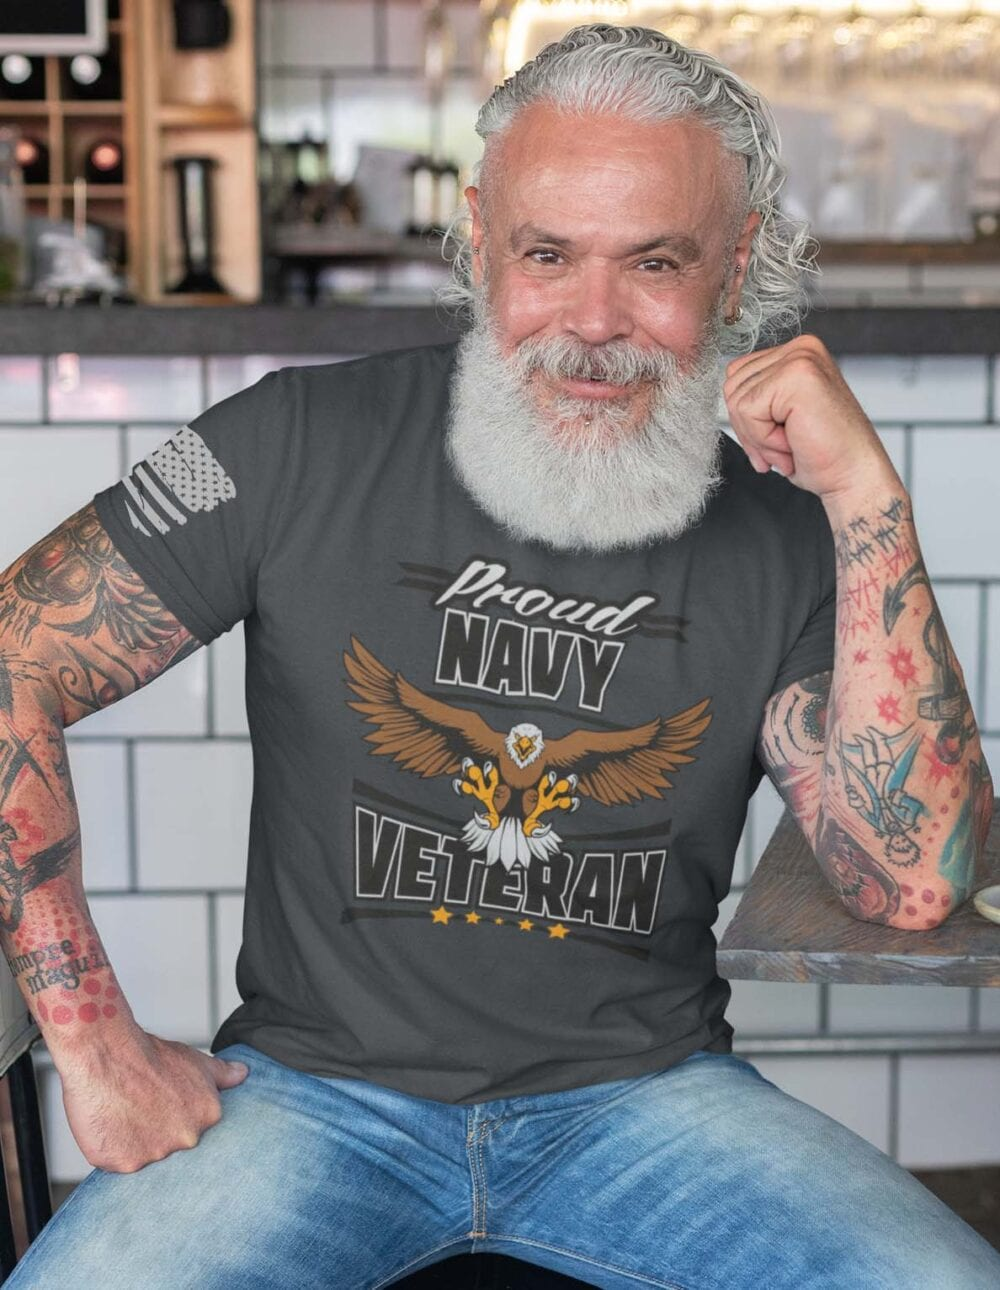 Navy Veteran On Men's Charcoal T-Shirt